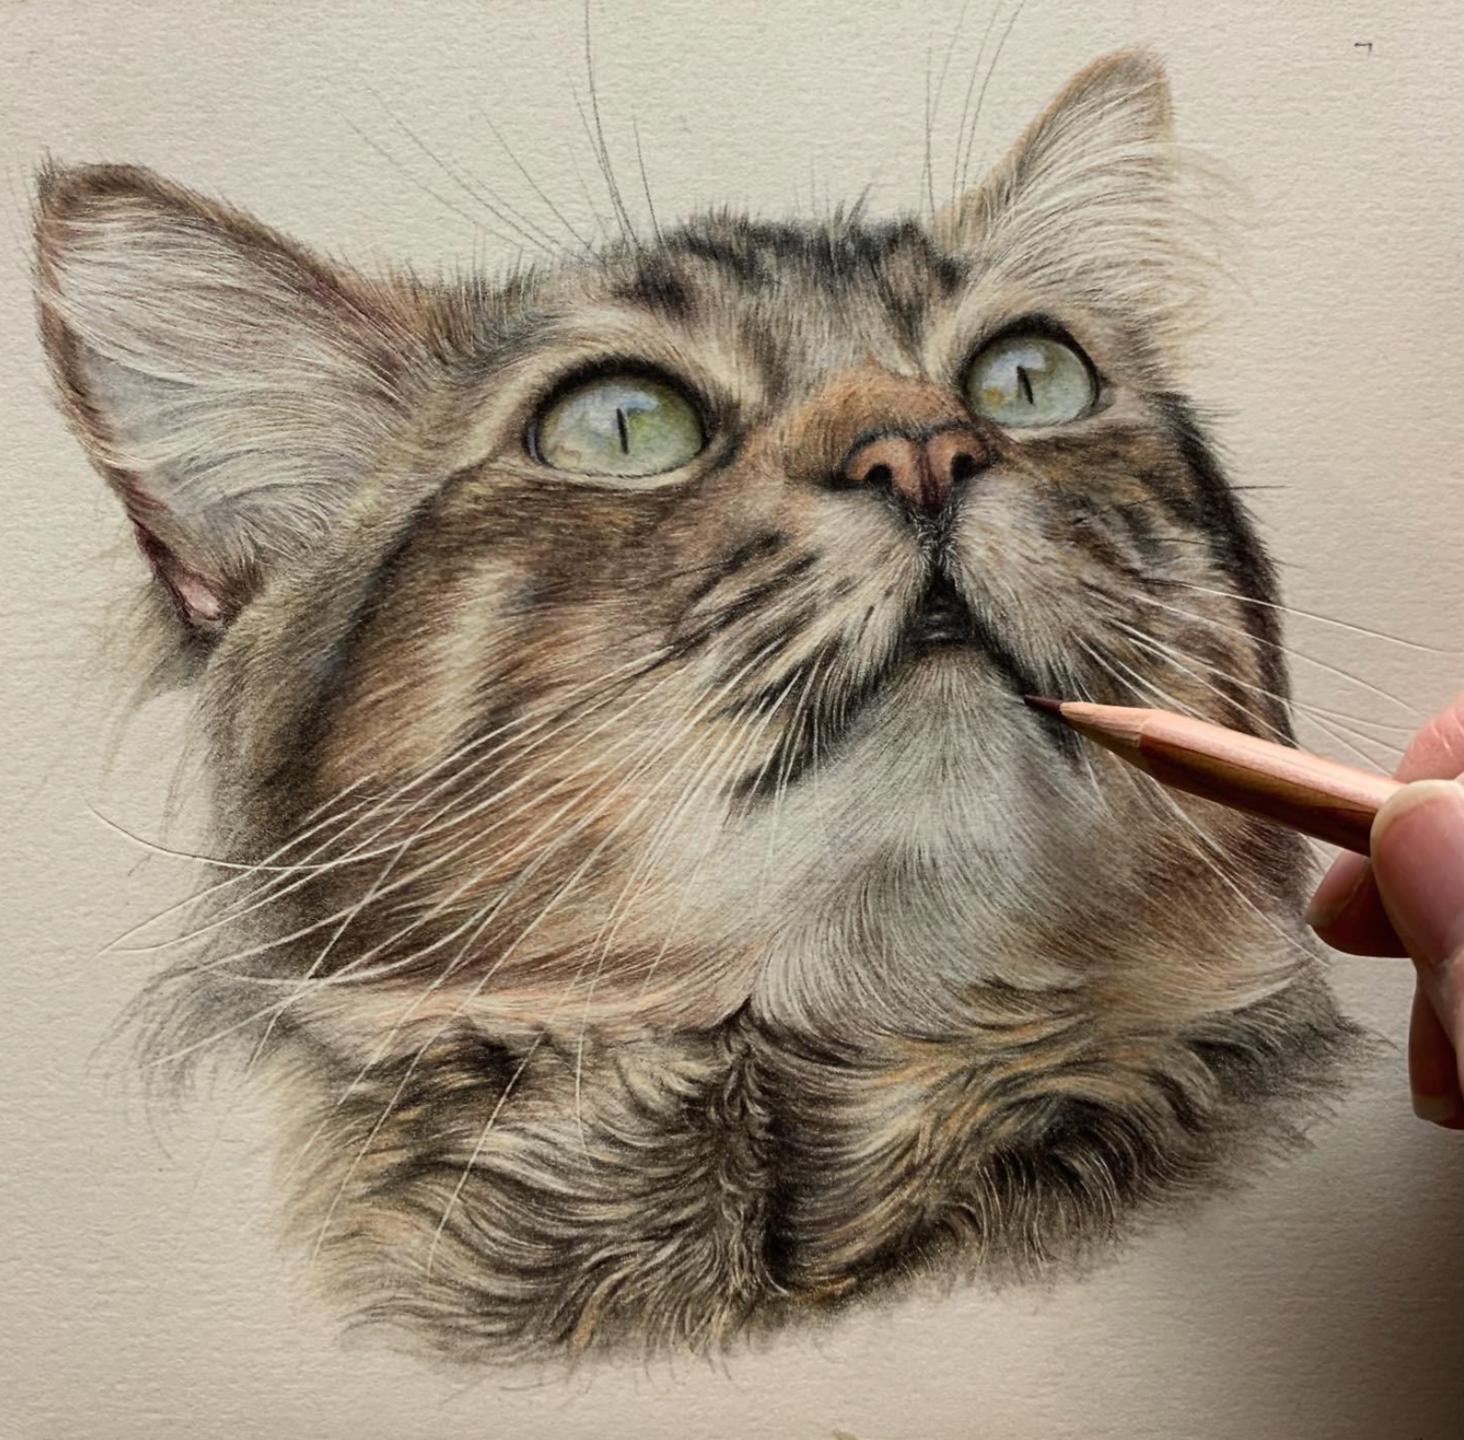 Cat Face - Patreon - Tutorial Gallery - Bonny Snowdon Fine Art